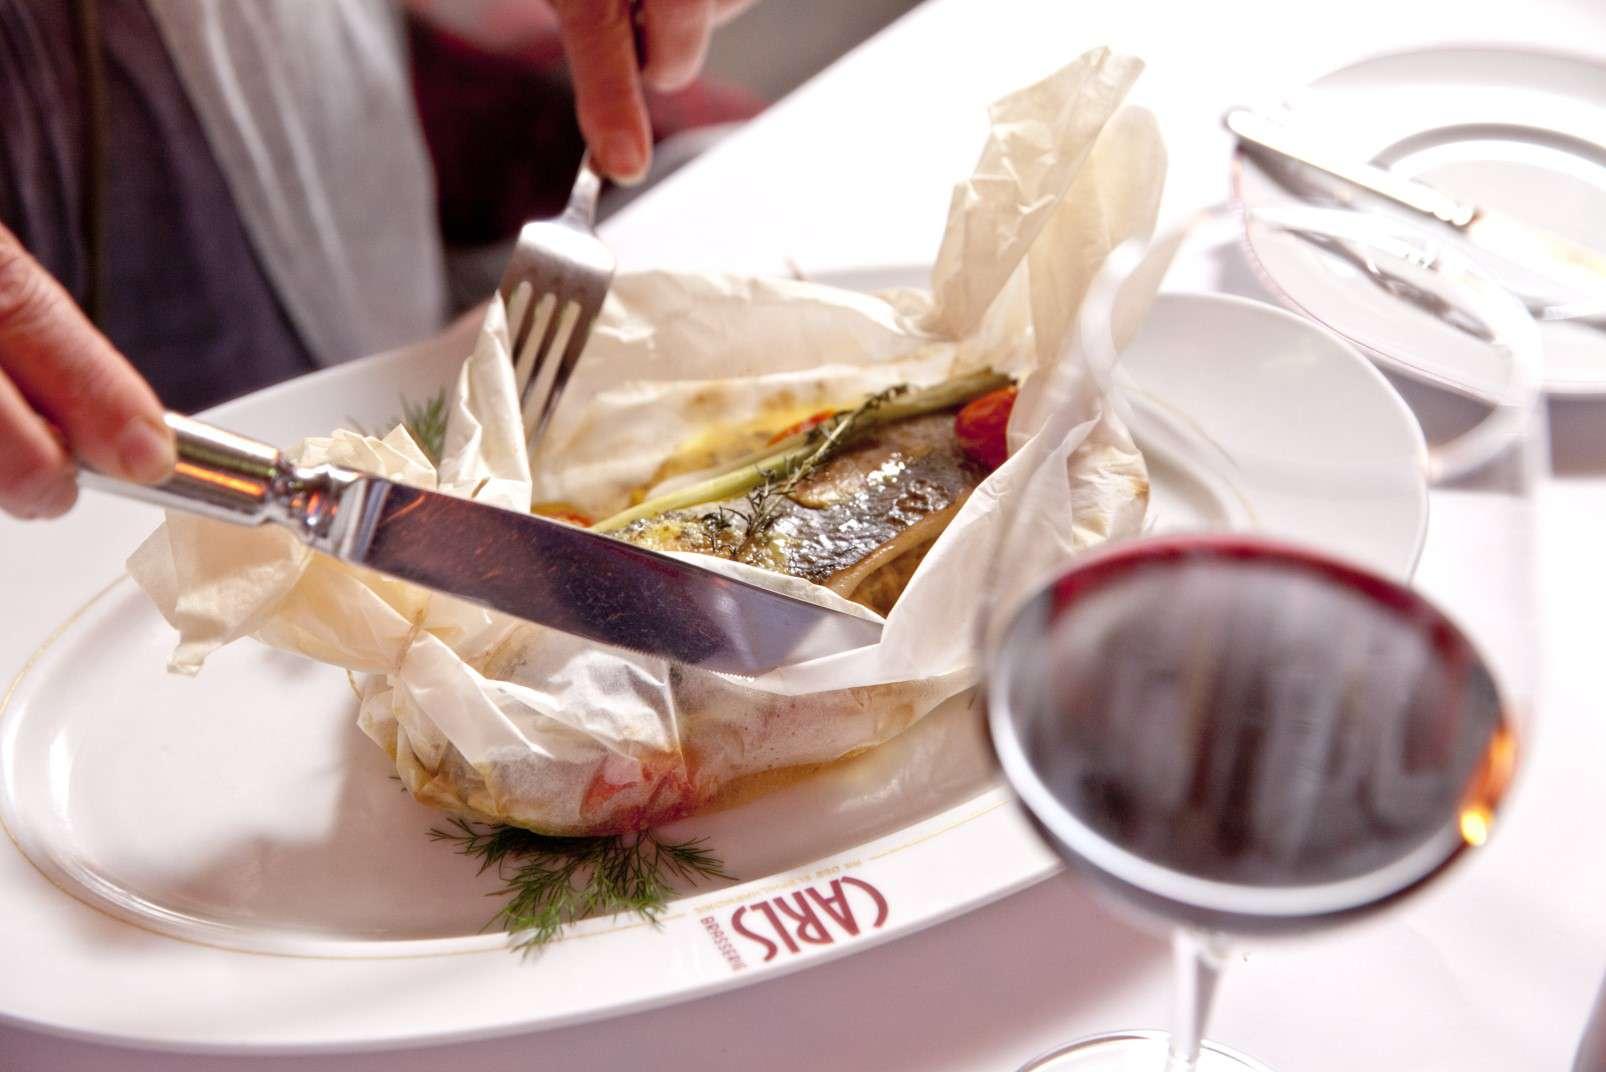 Carls Brasserie & Bistro Loup de Mer